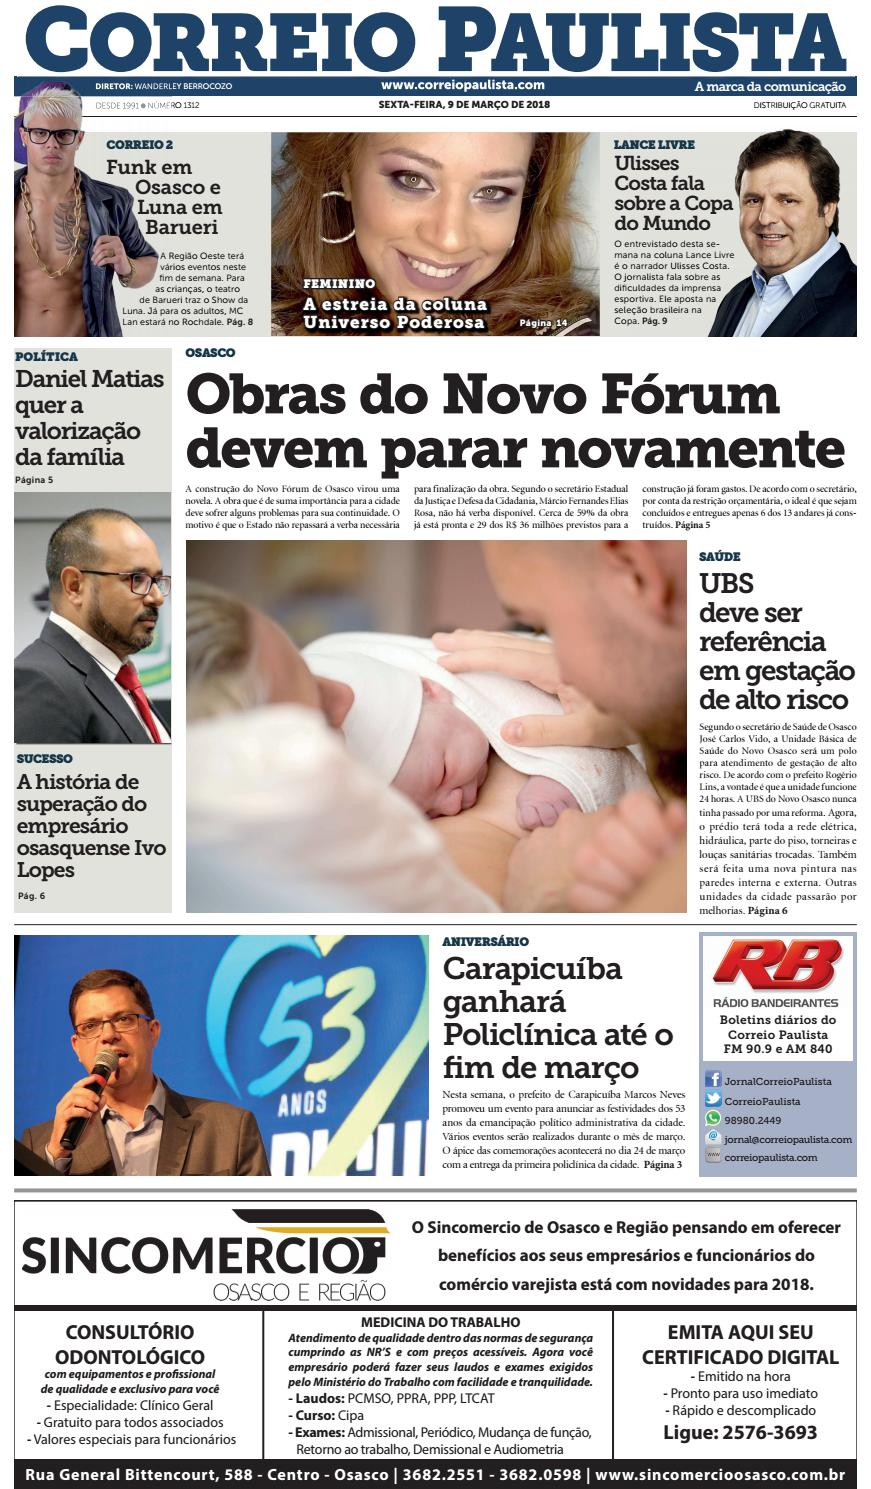 jornal Correio Paulista 1312 by Jornal Correio Paulista - issuu 00b84a6e8fe26